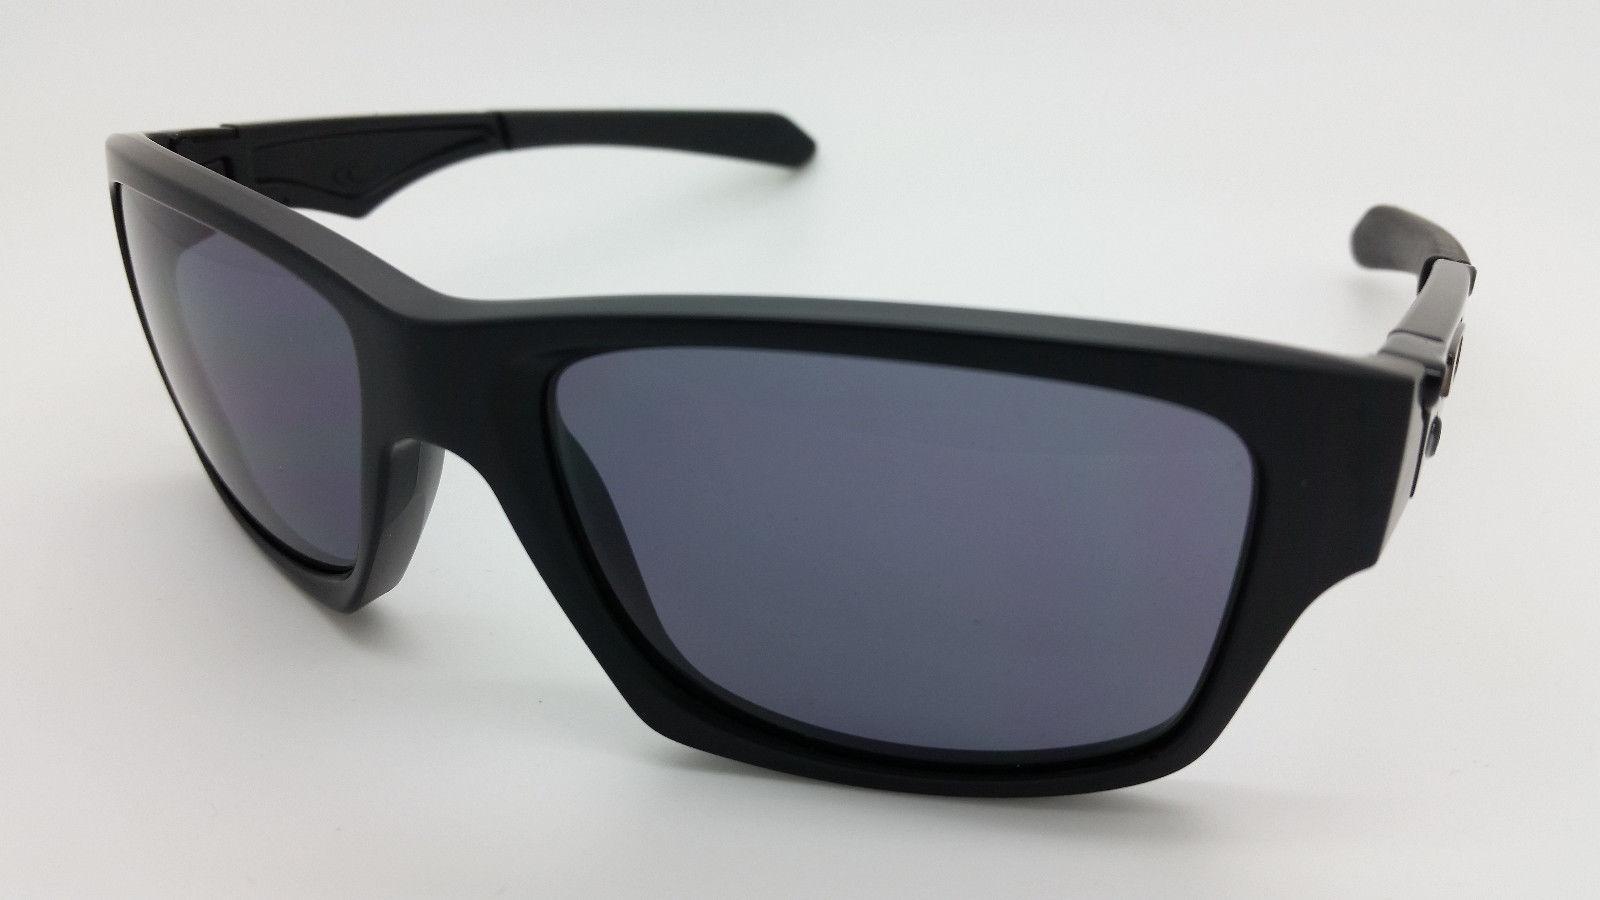 4b3a9320590 Oakley Cycling Sunglasses Nz « Heritage Malta